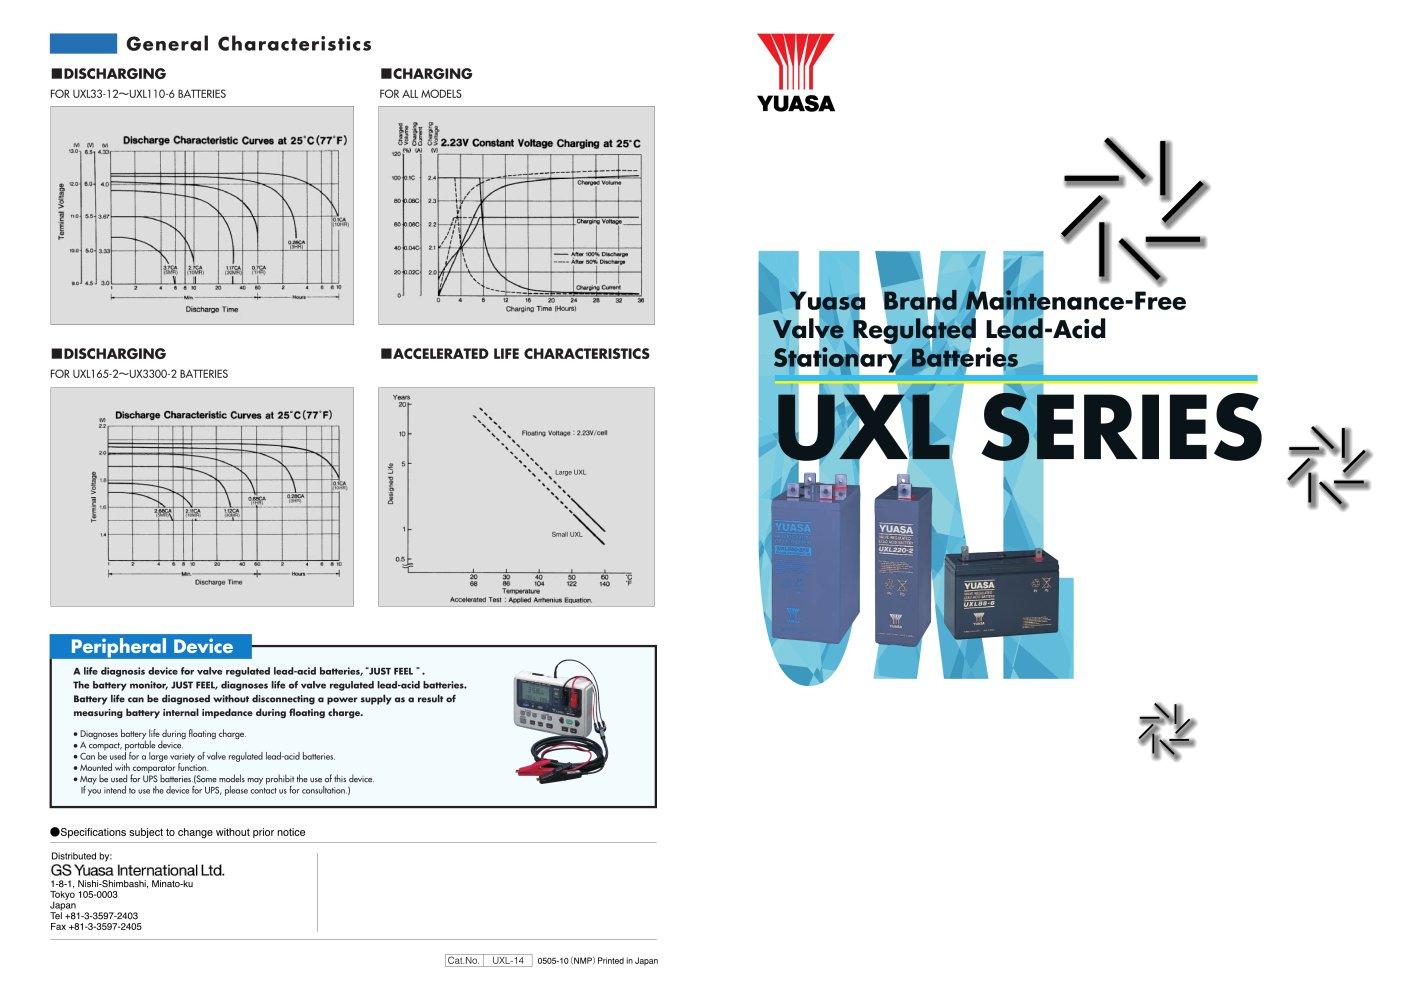 Lead Acid Stationary Batteries Uxl Series Gs Yuasa Pdf Catalogue Battery Diagram 1 2 Pages